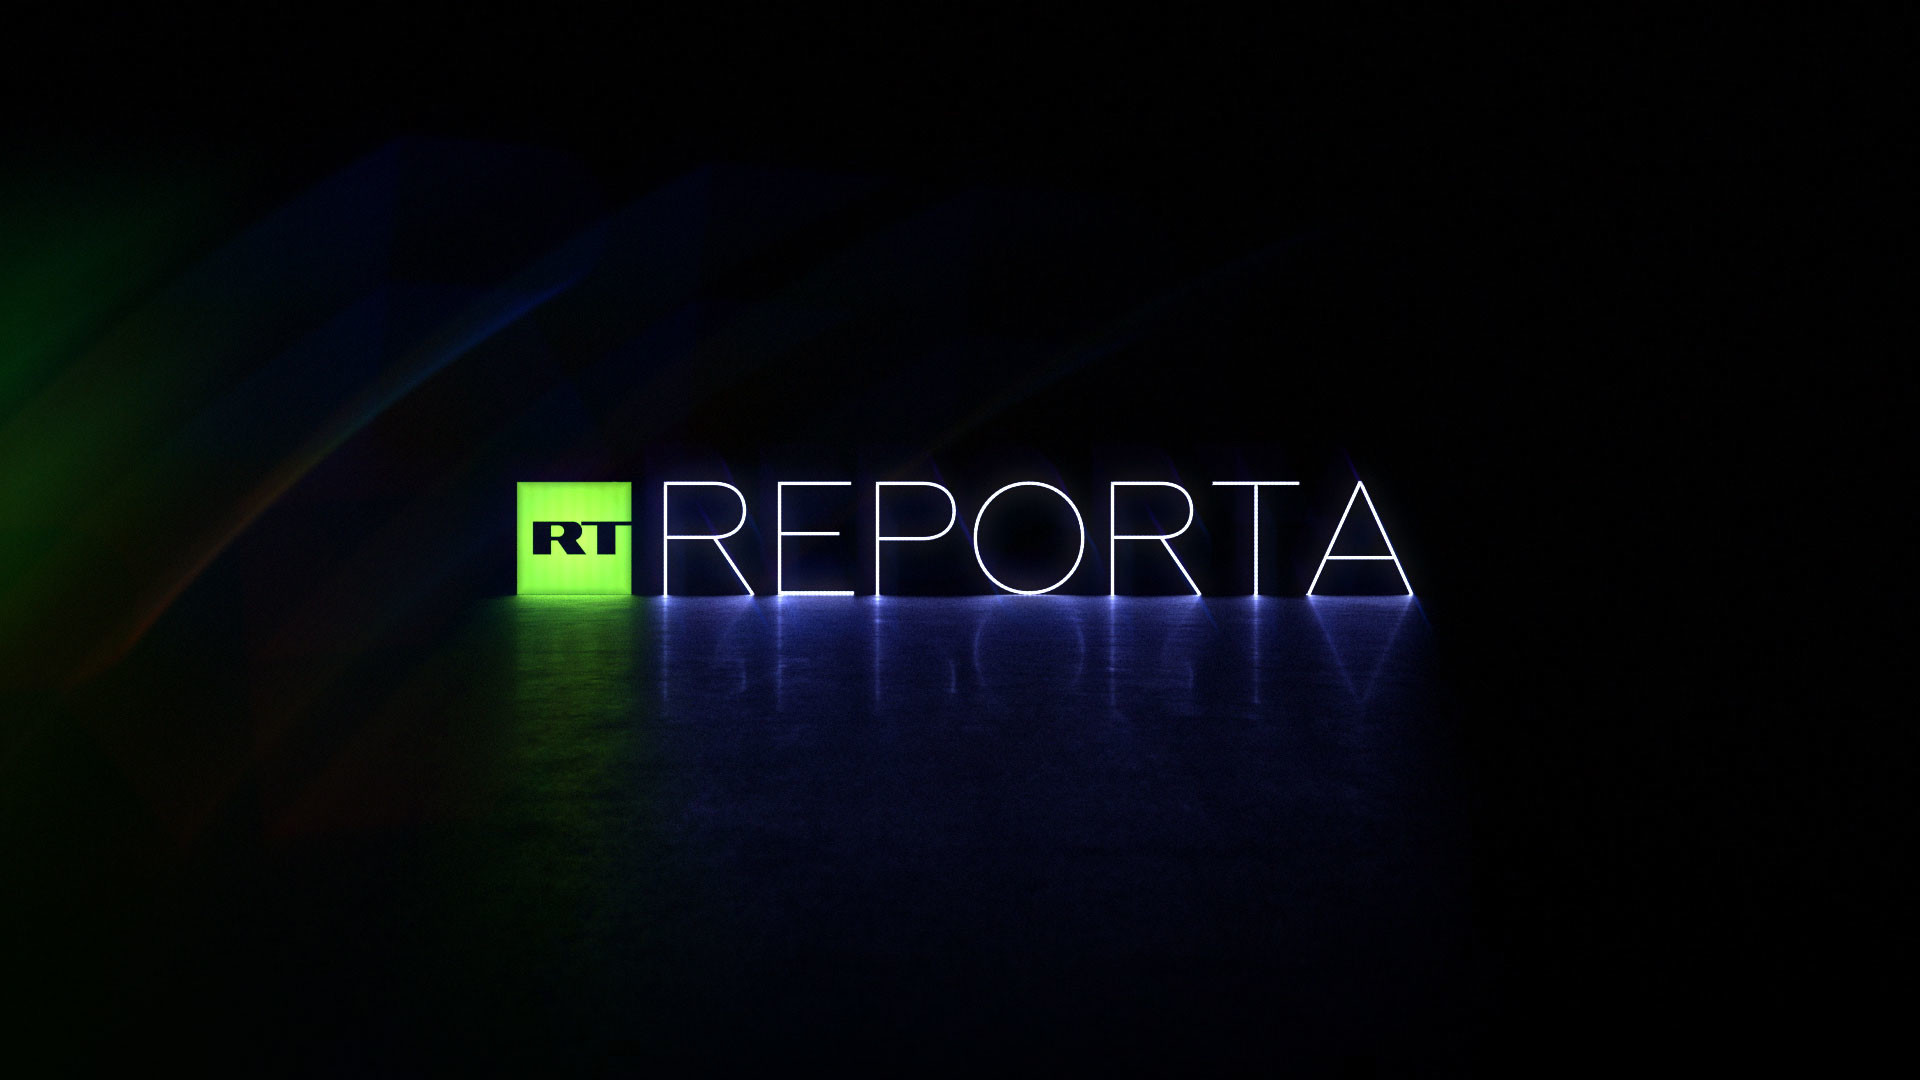 RT reporta